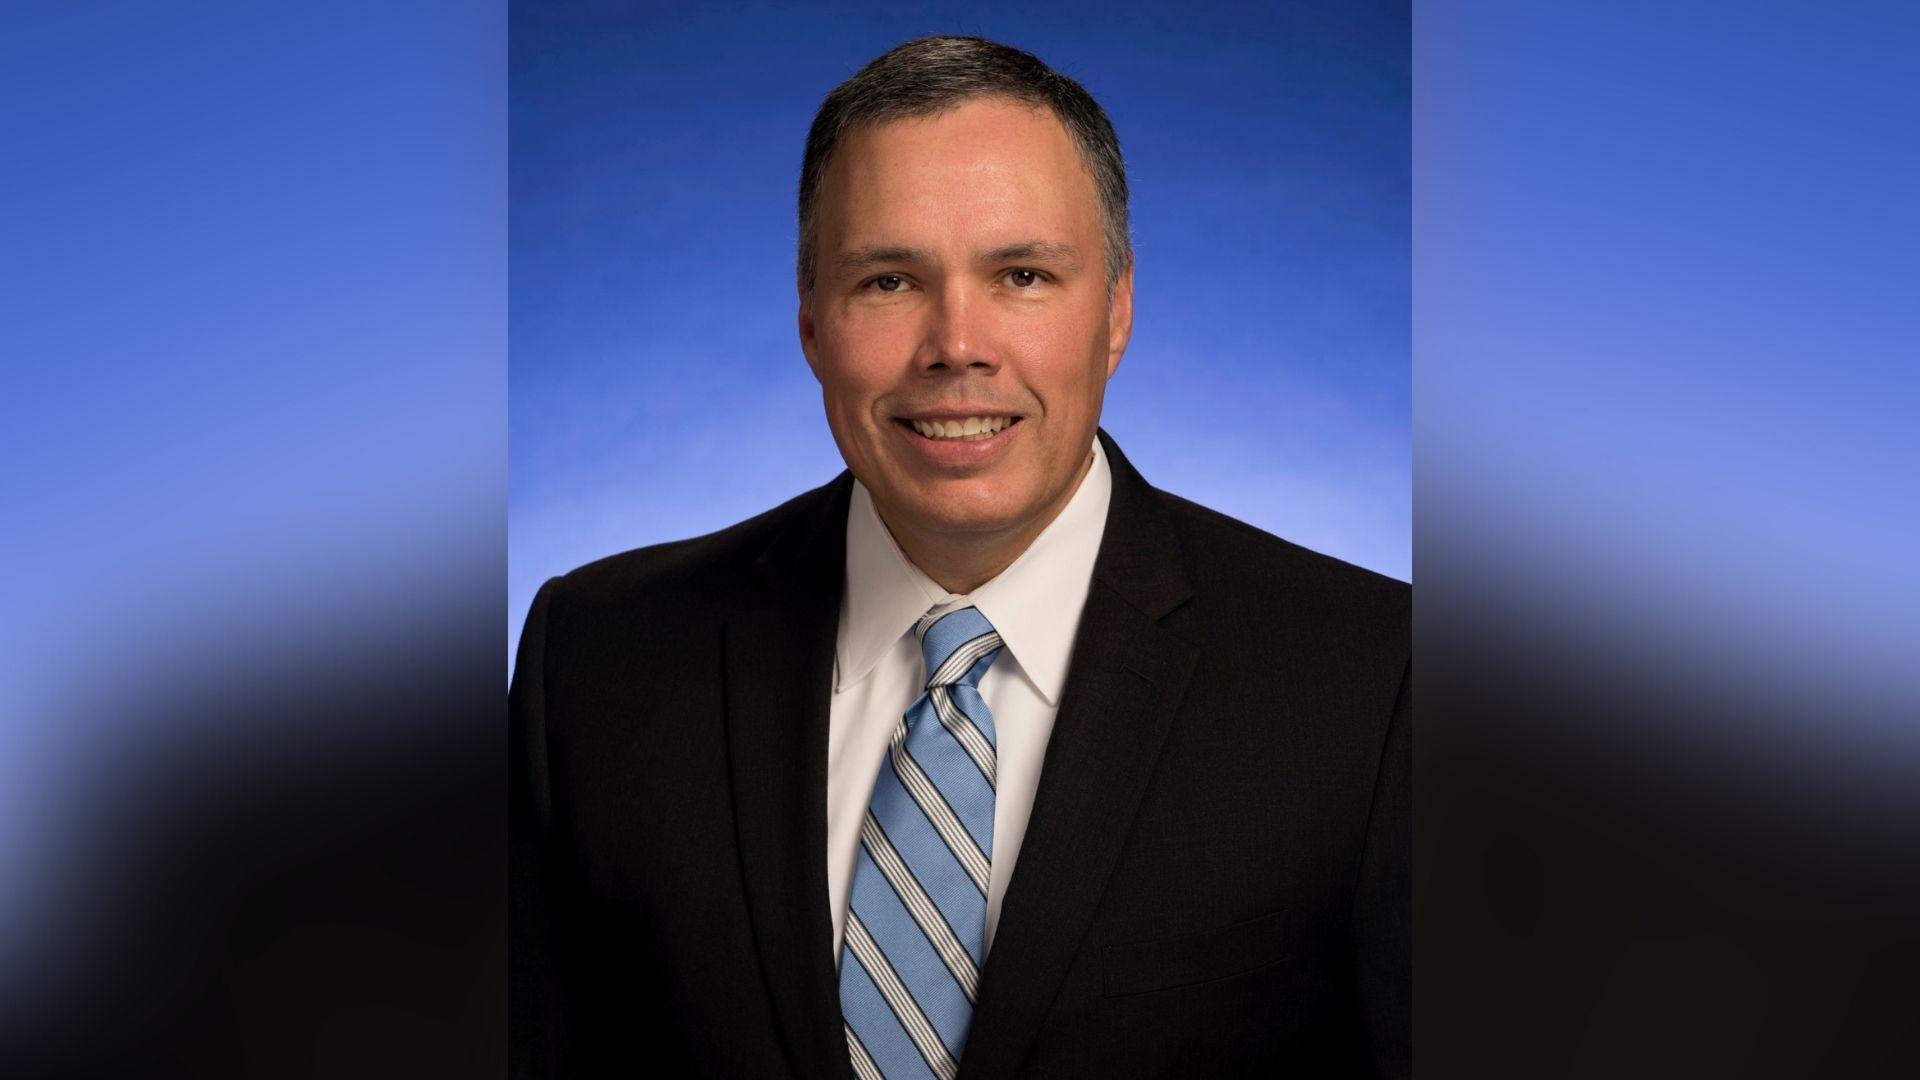 Dr. Bryan Terry